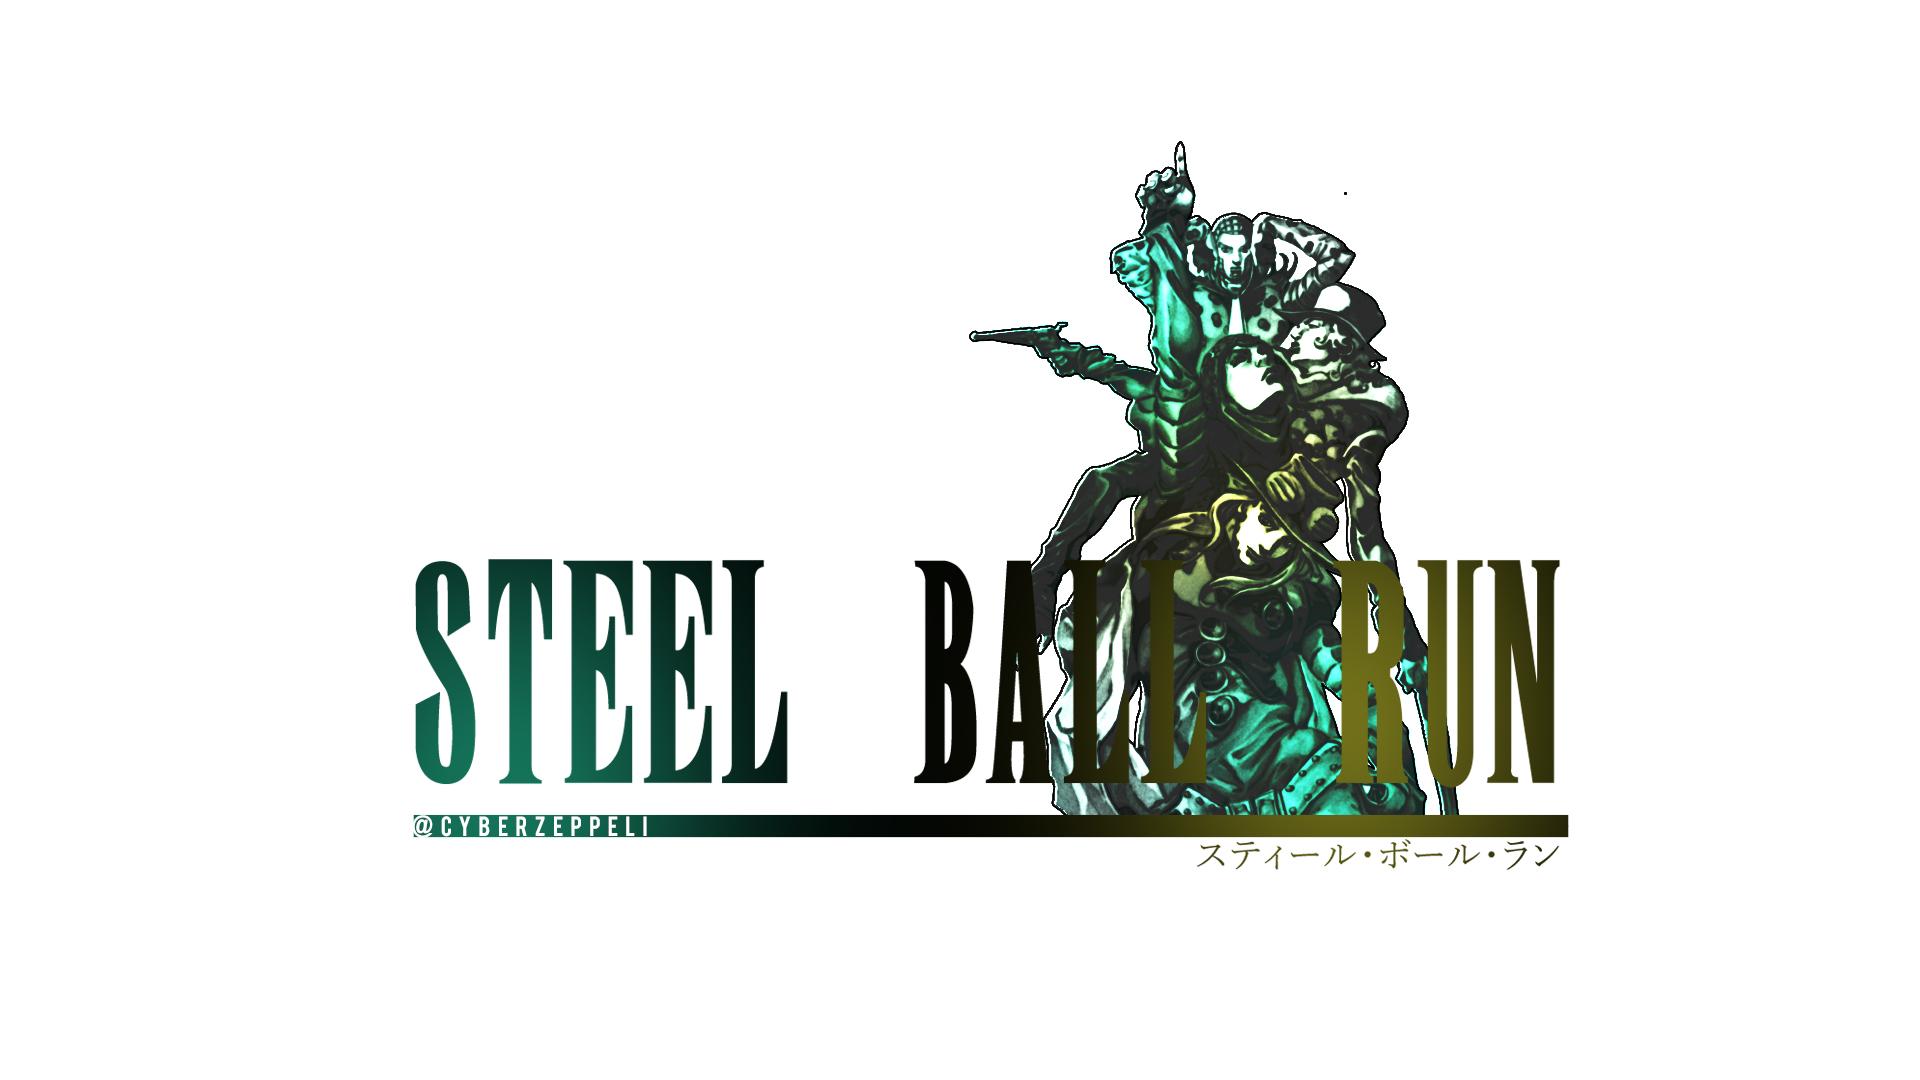 Fanart]I made a Steel Ball Run with Final Fantasy Style Logo.